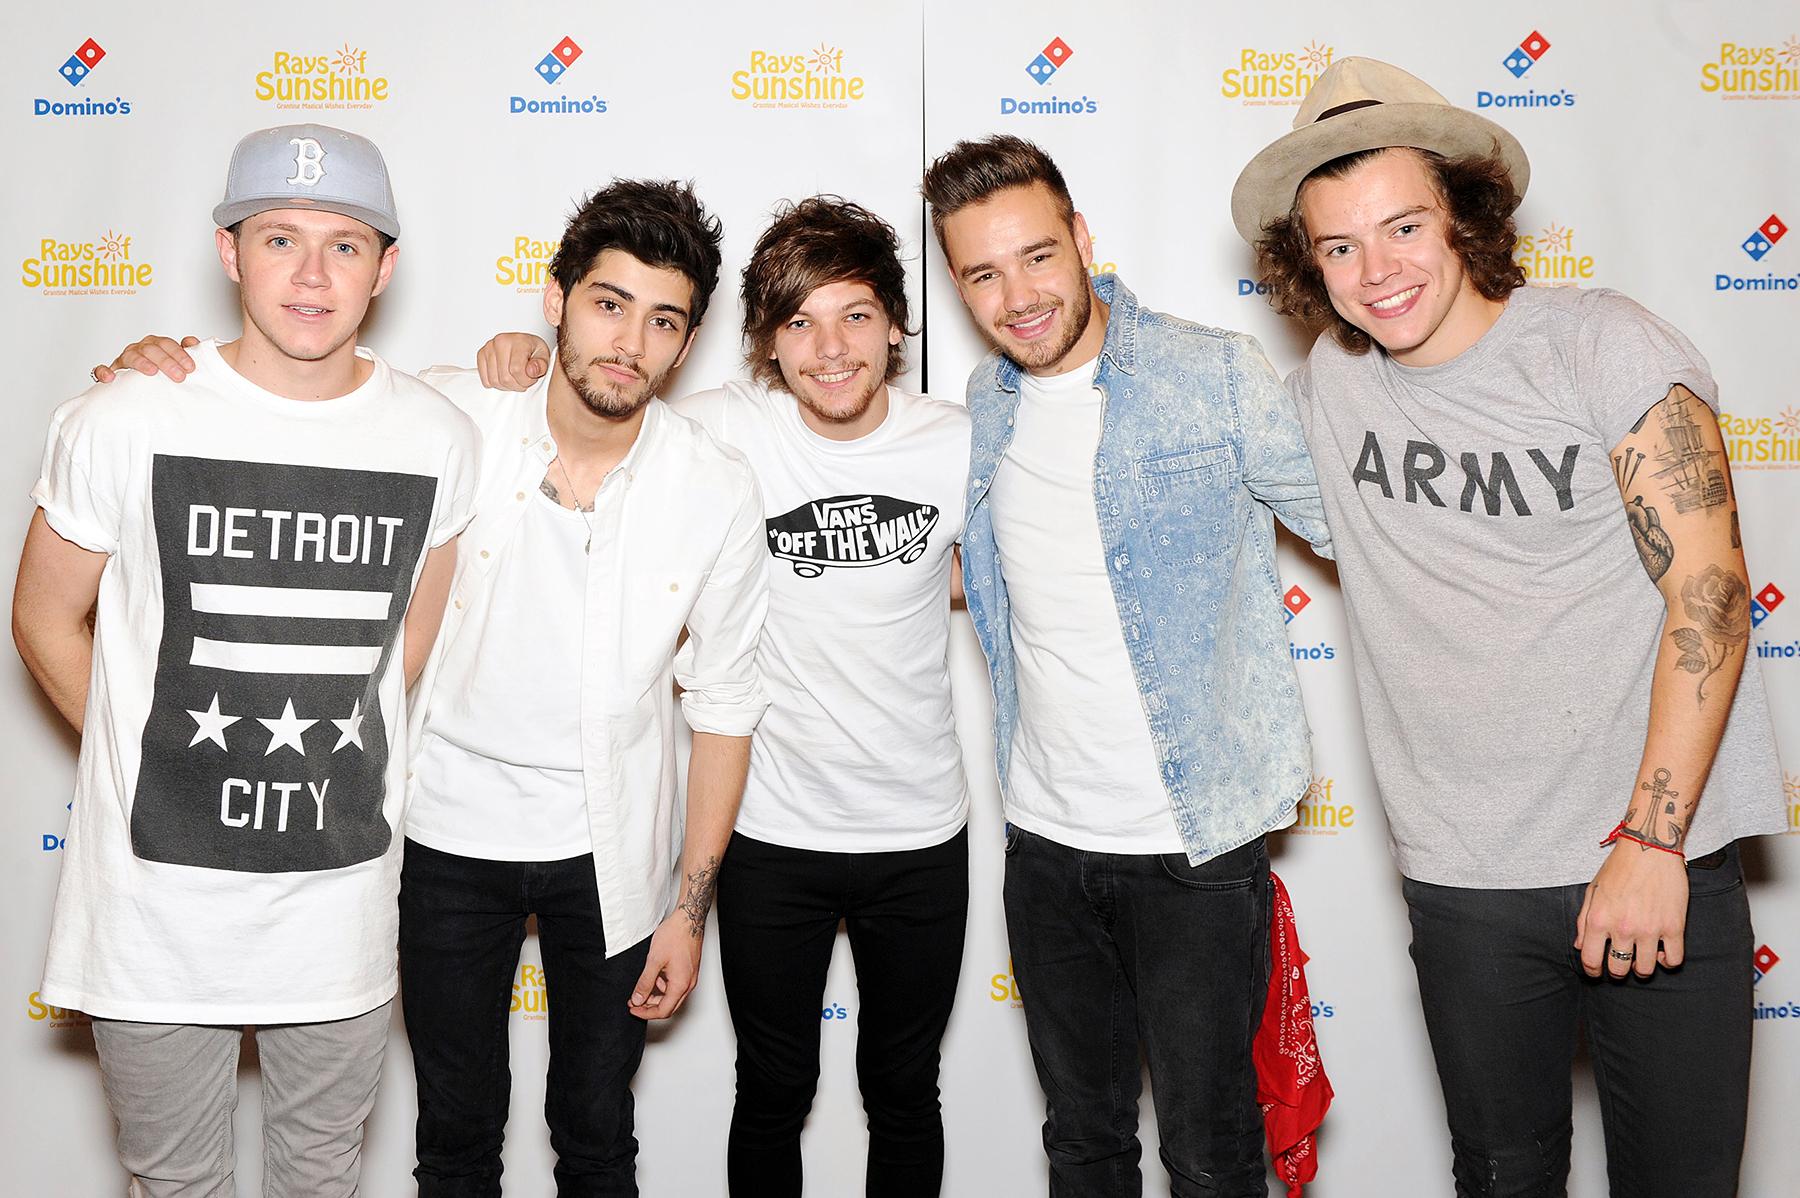 Niall Horan Zayn Malik Louis Tomlinson Liam Payne Harry Styles One Direction